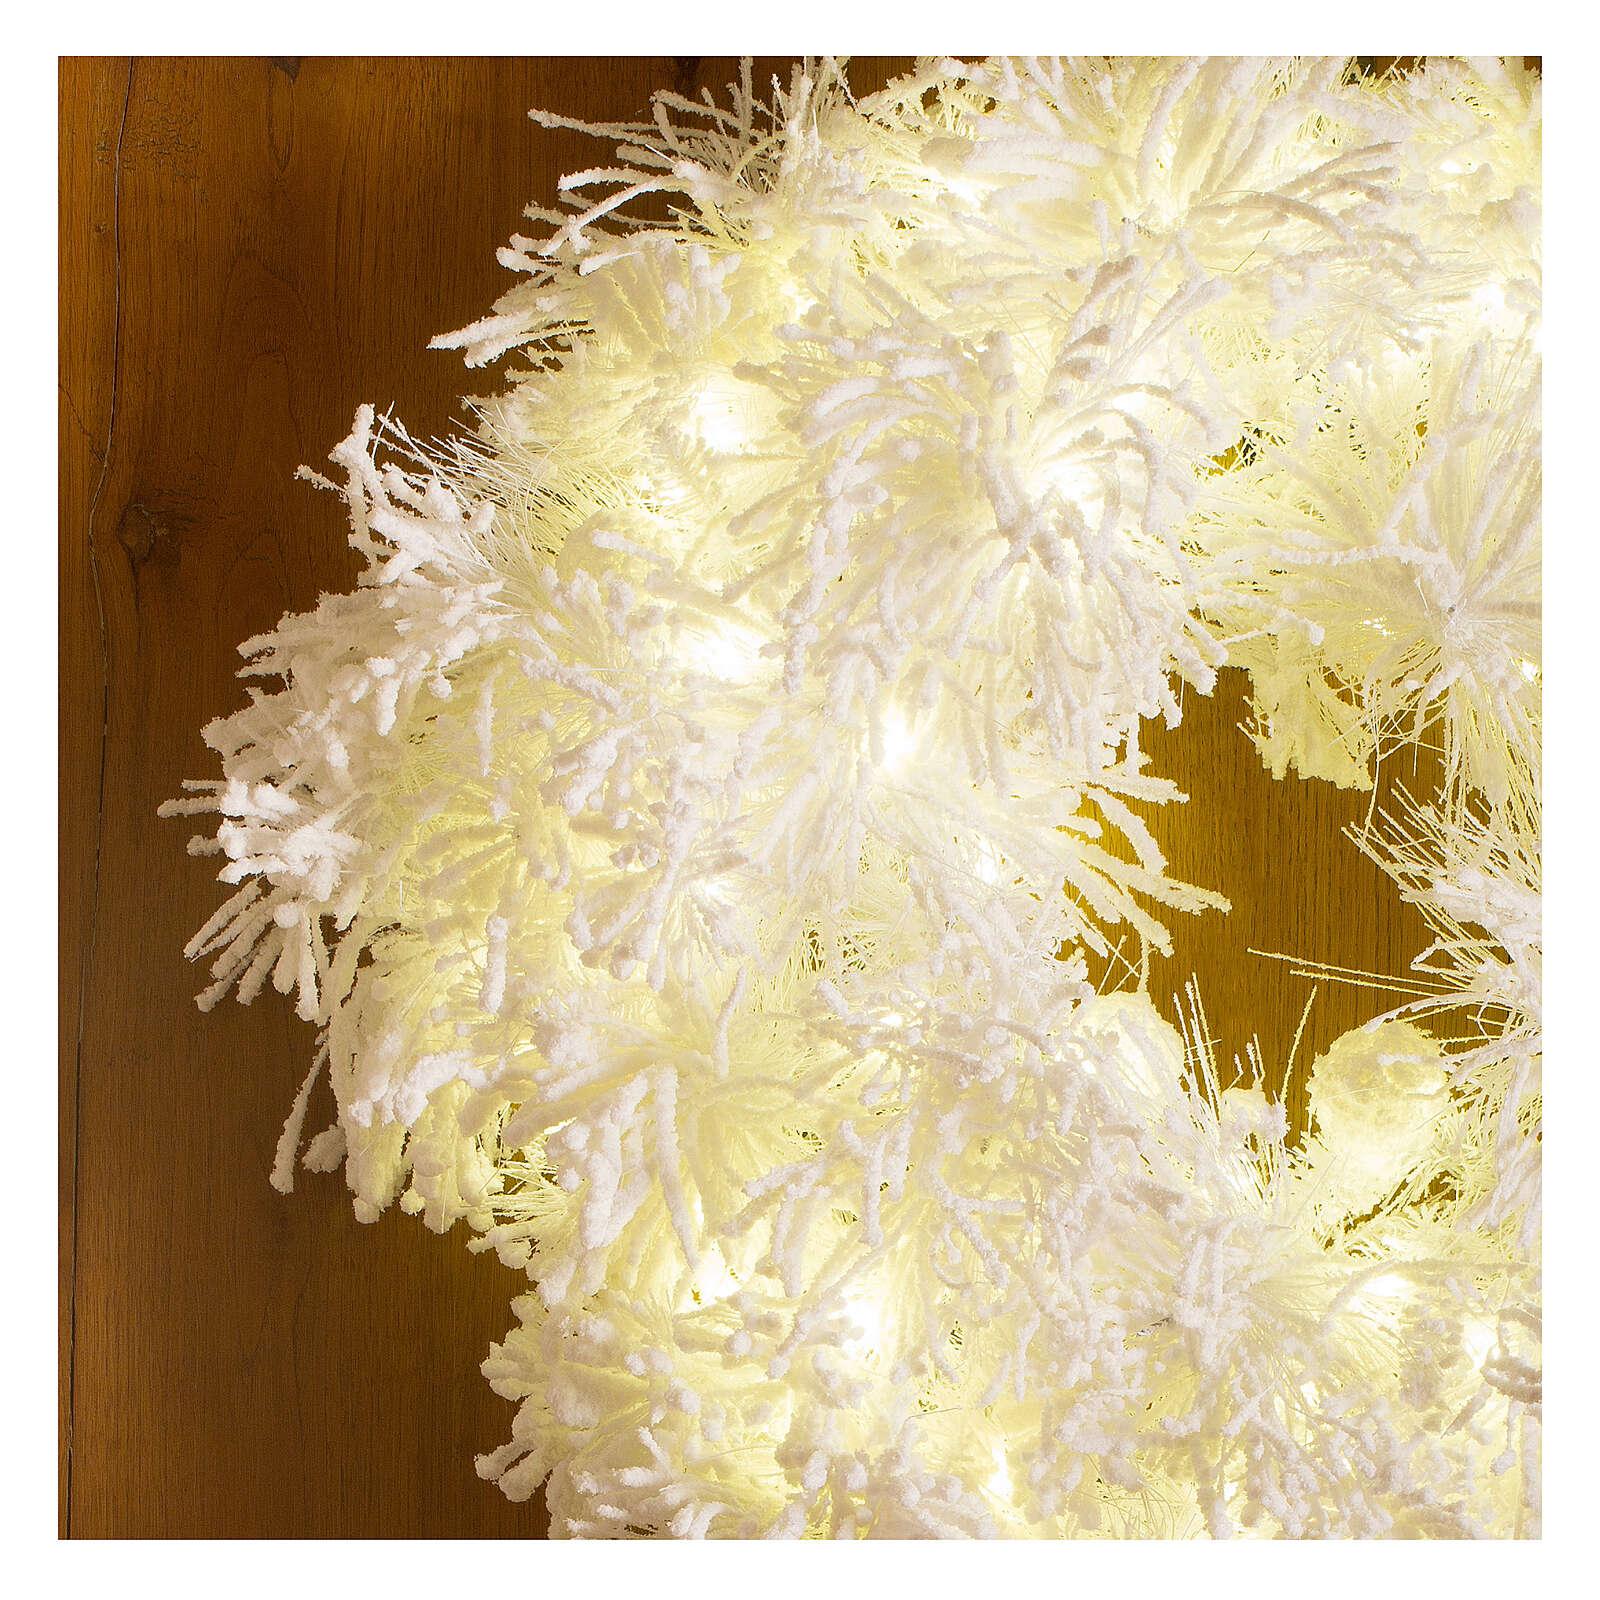 STOCK Corona Avvento White Cloud 100 led diam. 75 cm 3